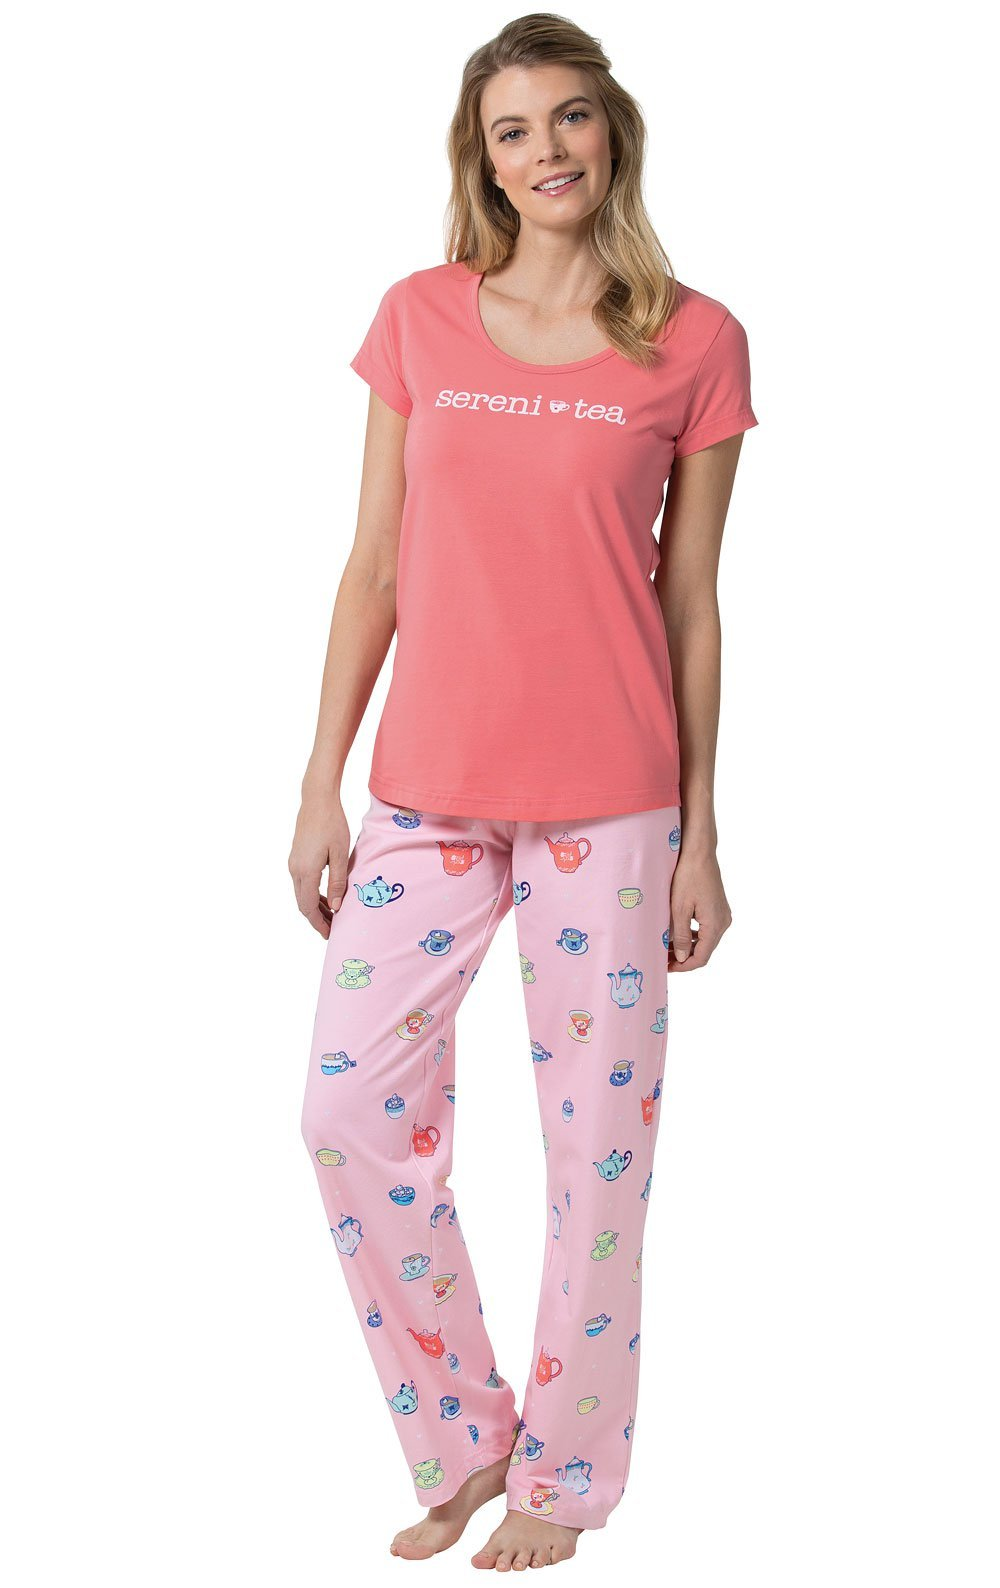 PajamaGram Sereni-Tea Women's Pajamas and Short-Sleeved Top, Pink